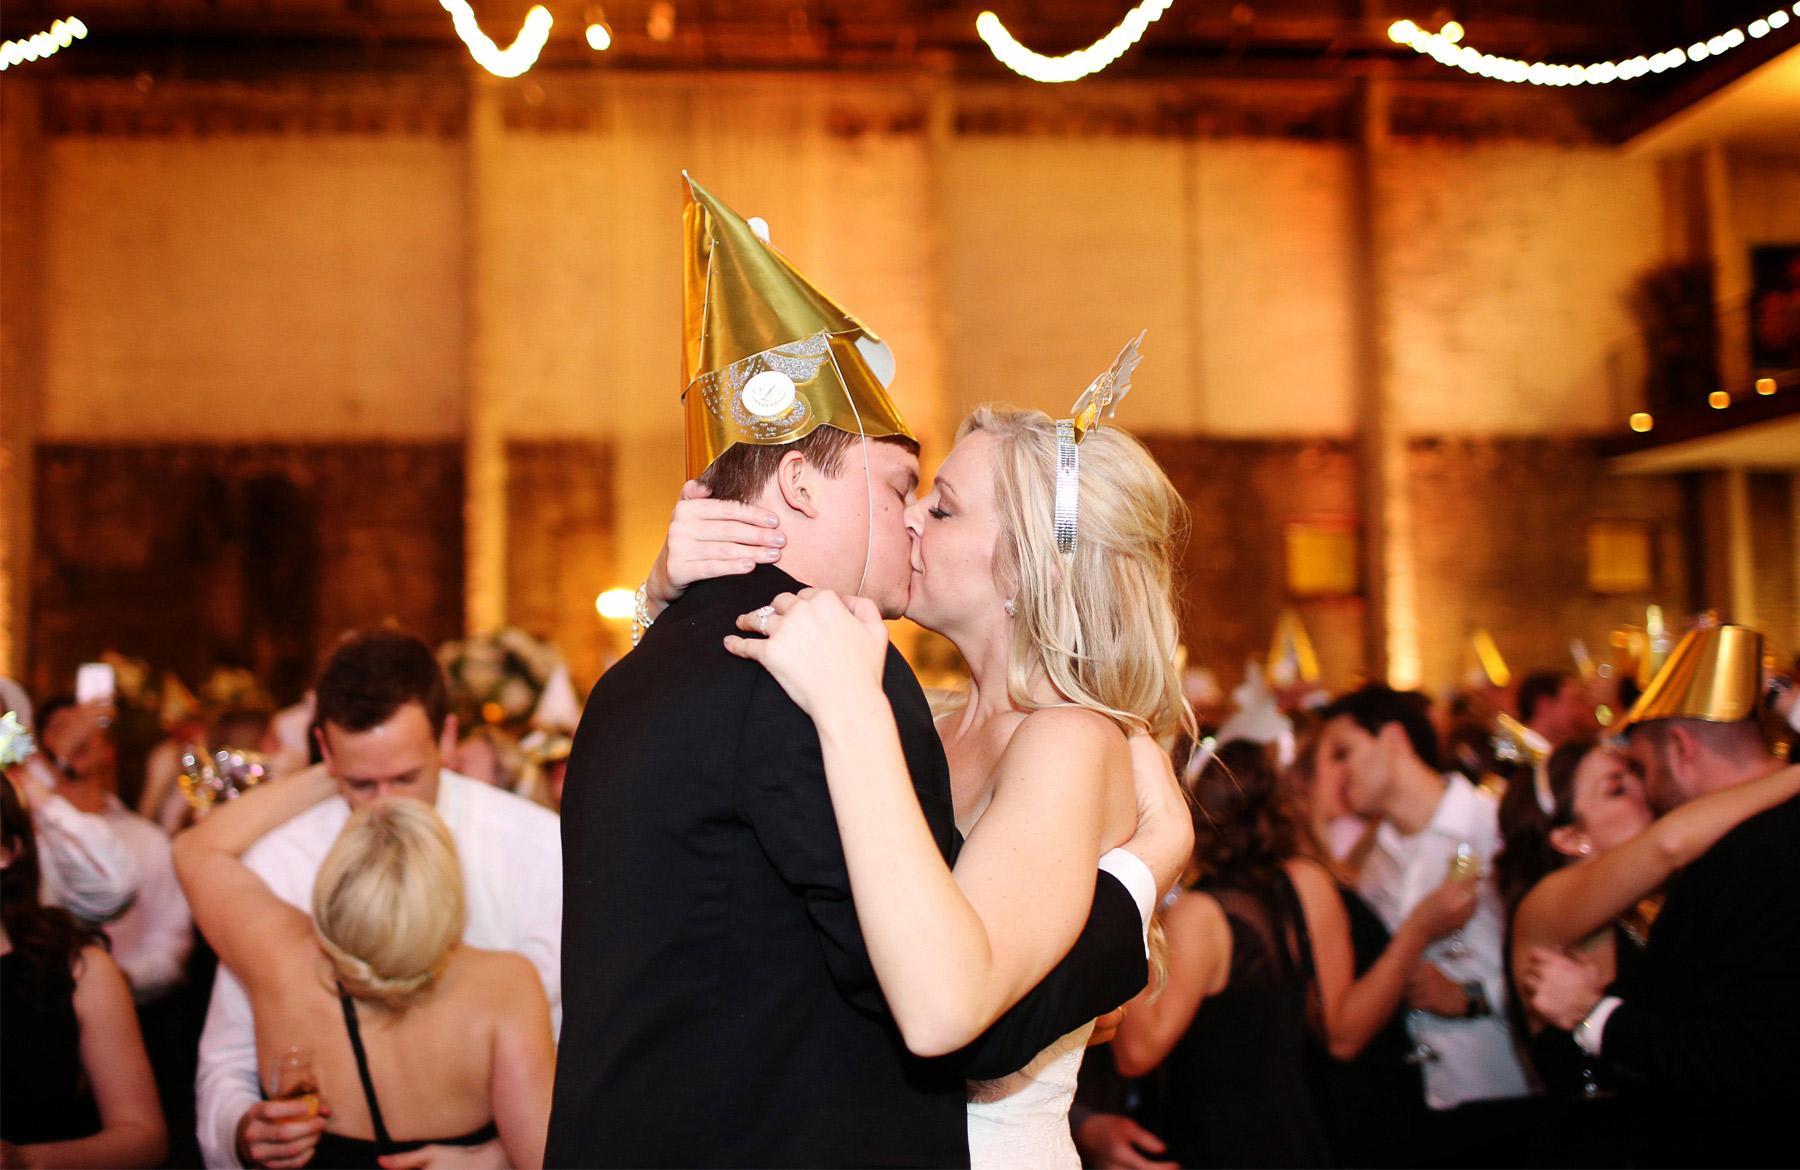 21-Minneapolis-Minnesota-Wedding-Photography-by-Vick-Photography-Aria-New-Years-Eve-Reception-Caroline-and-J.jpg